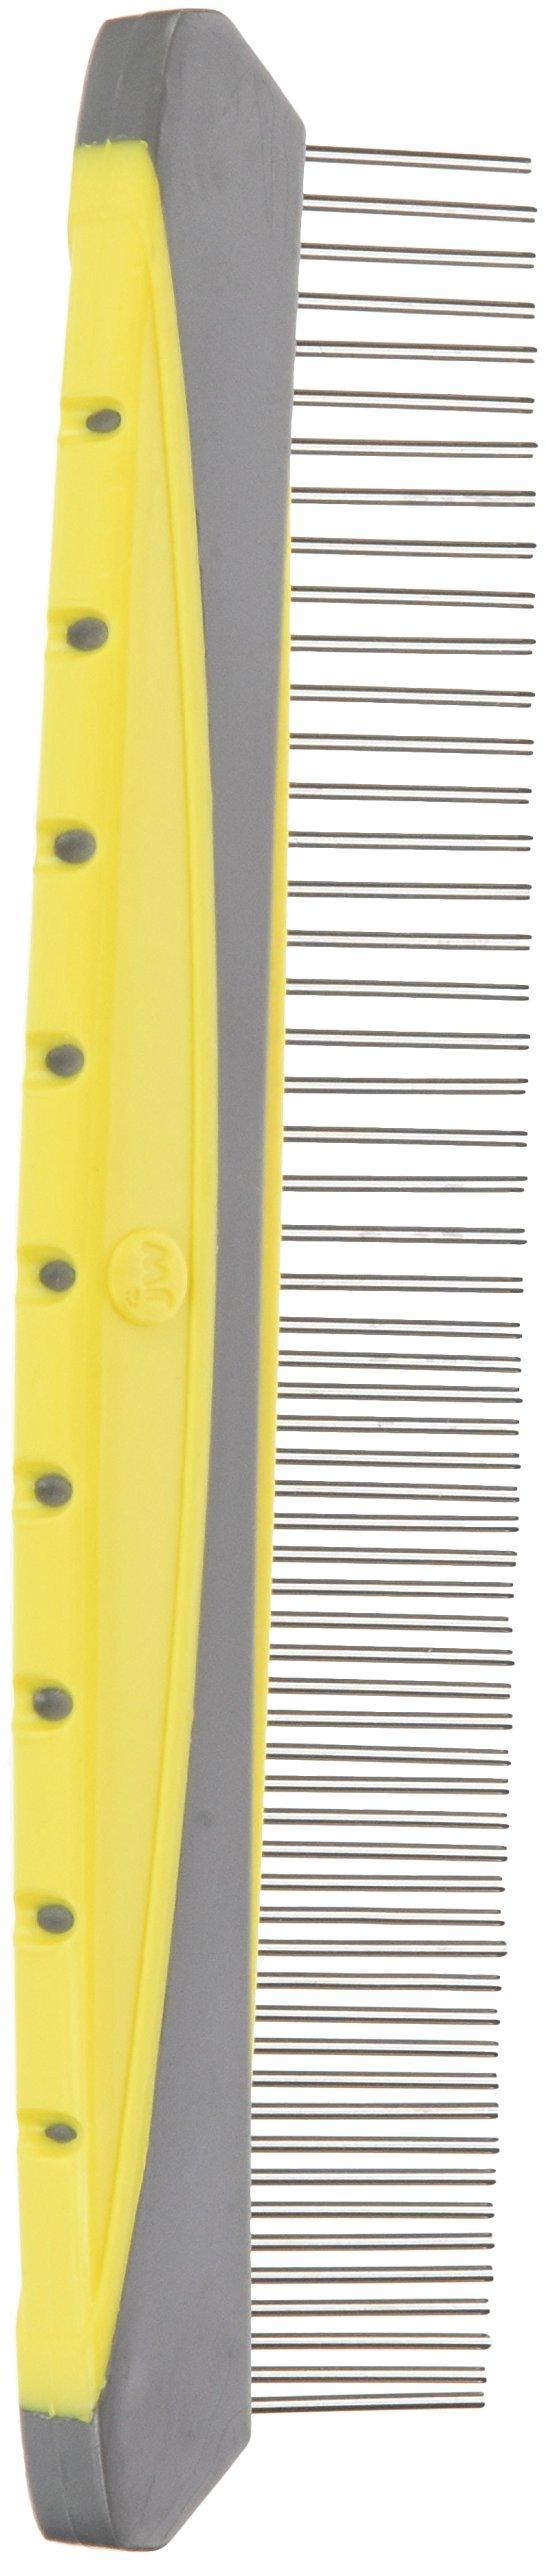 JW Pet Company 8-Inch Gripsoft Rotating Comfort Comb, Fine and Coarse